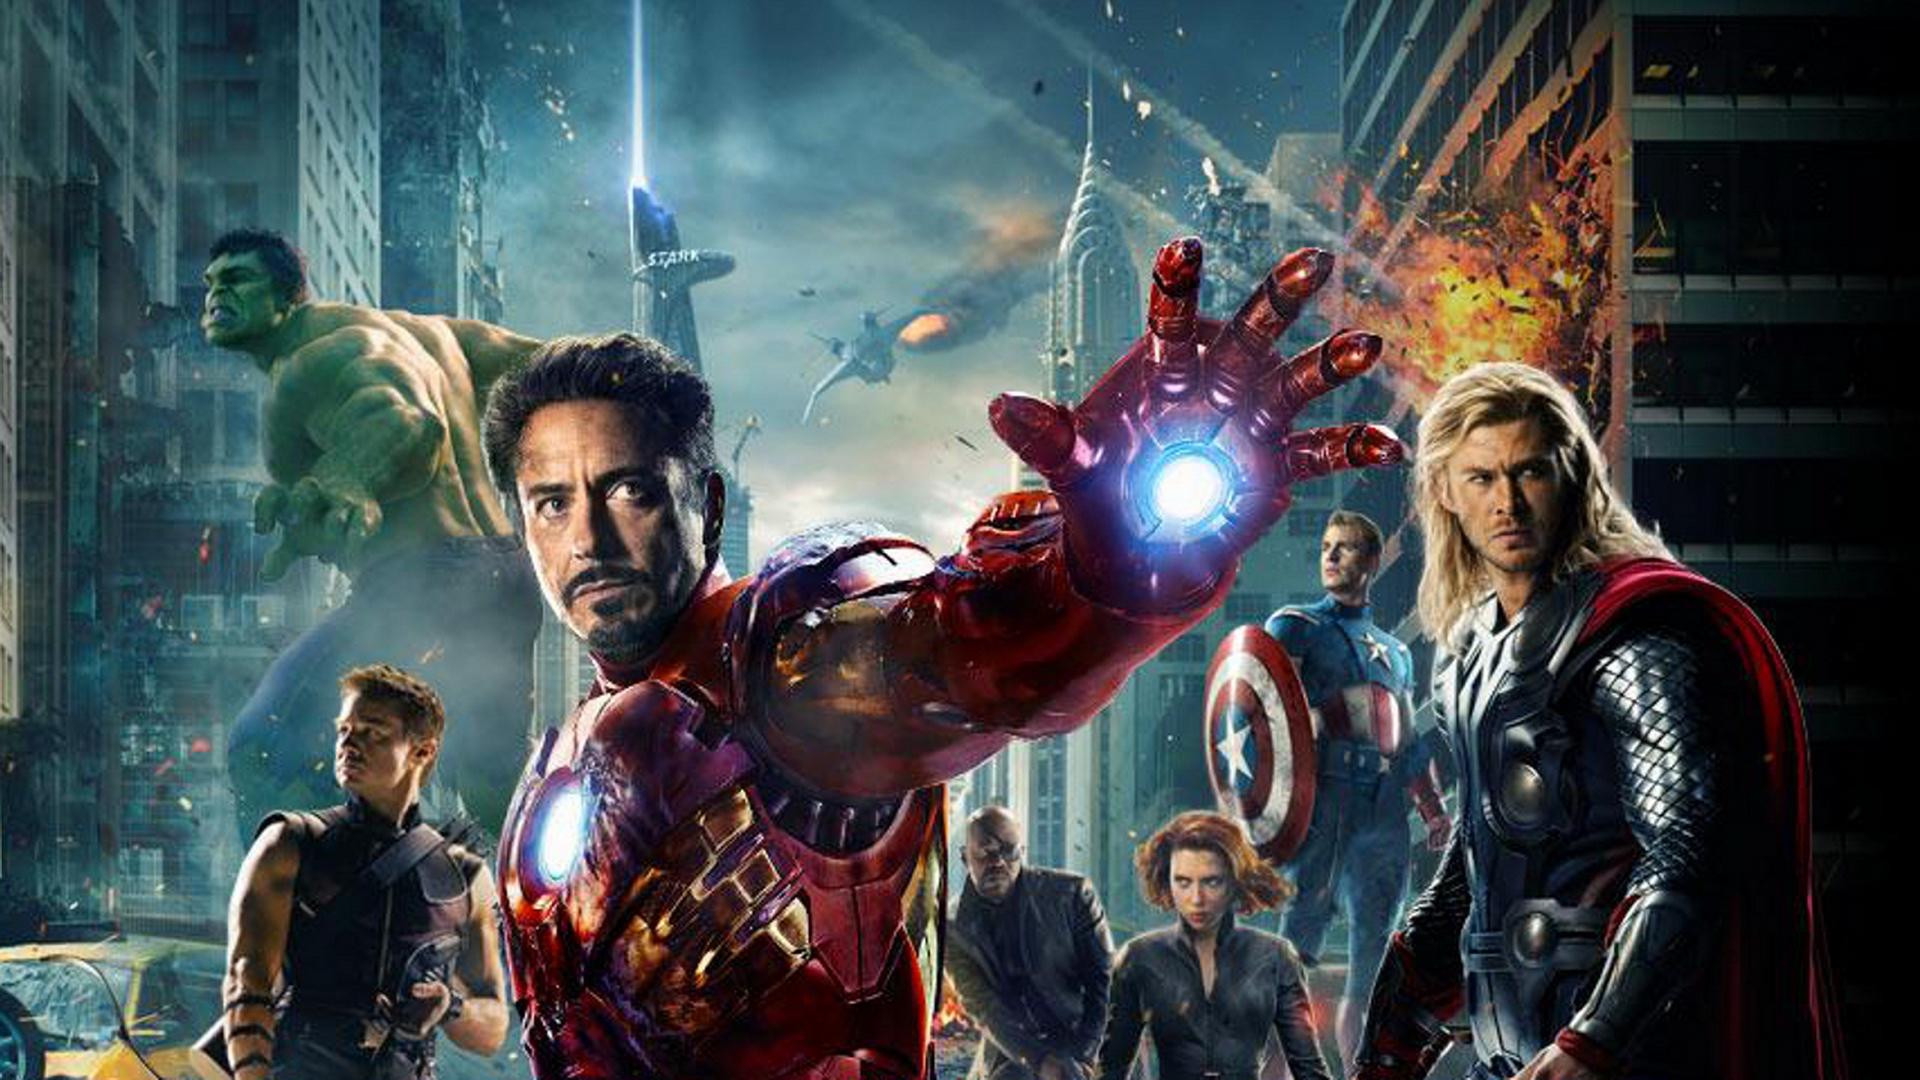 Marvel avengers hd wallpaper wallpapersafari - Wallpaper avengers 3d ...